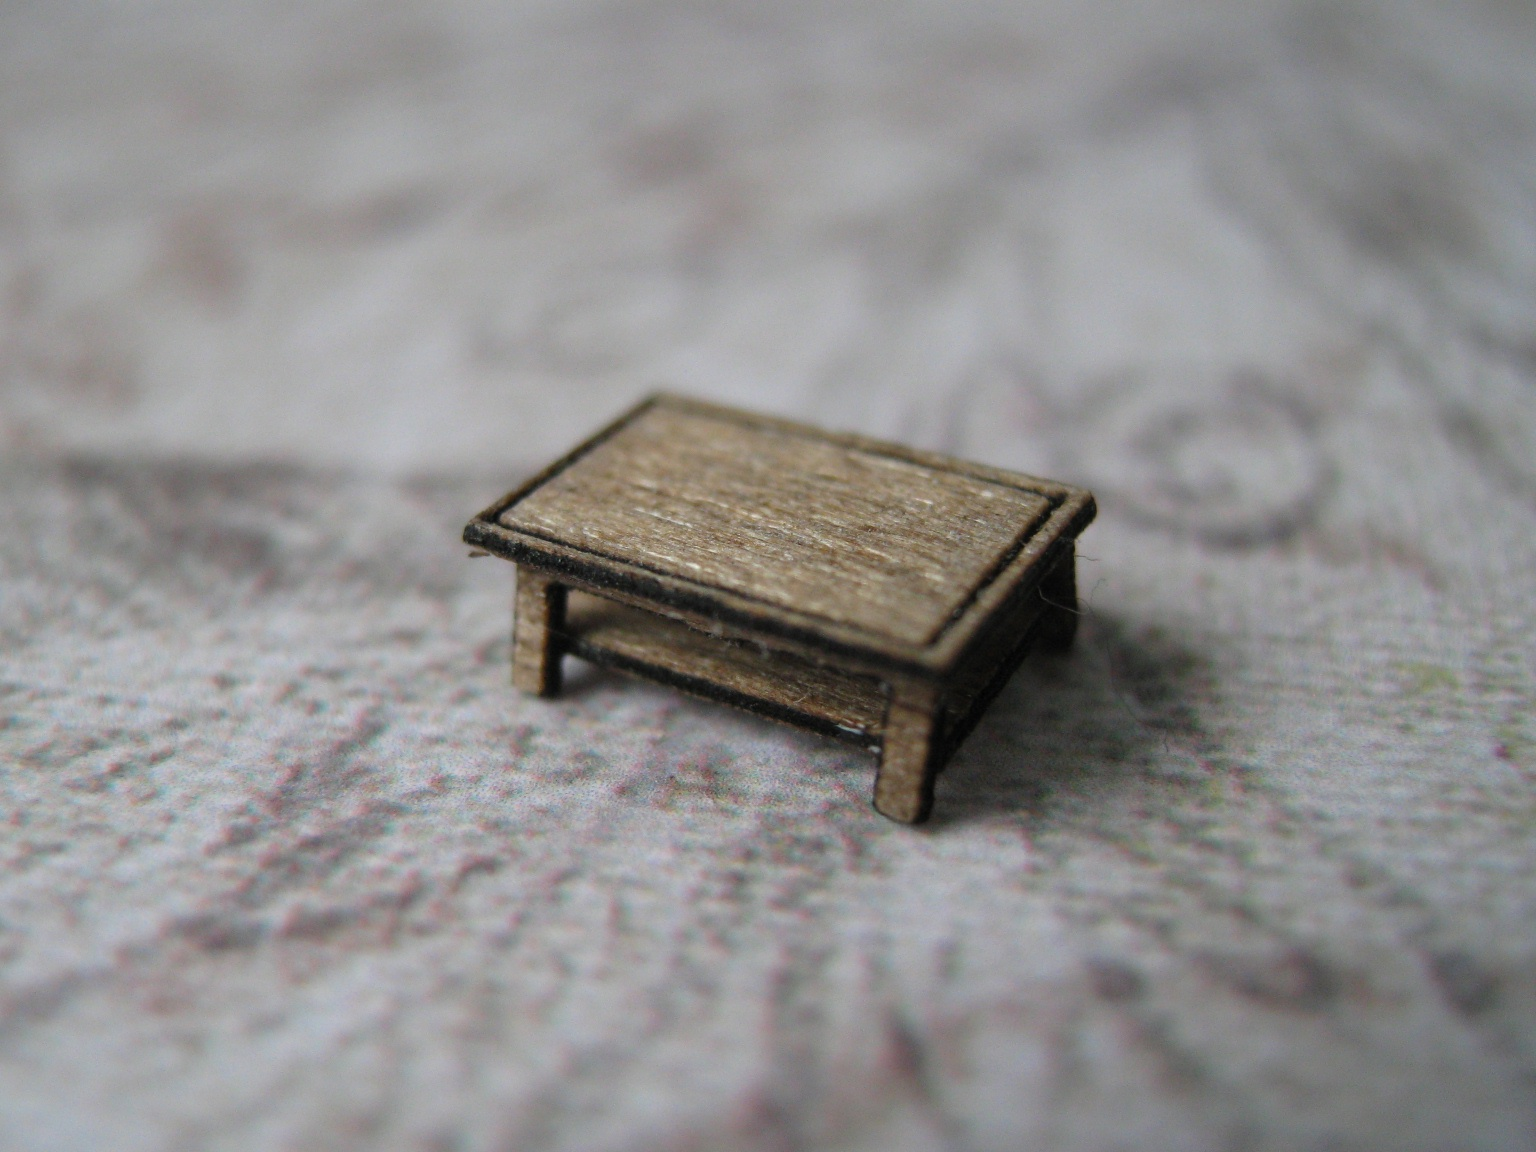 http://3.bp.blogspot.com/_Rc60zCq751w/TFfePgK7VII/AAAAAAAABmc/t1OFqFz2SKw/s1600/coffee+table.jpg